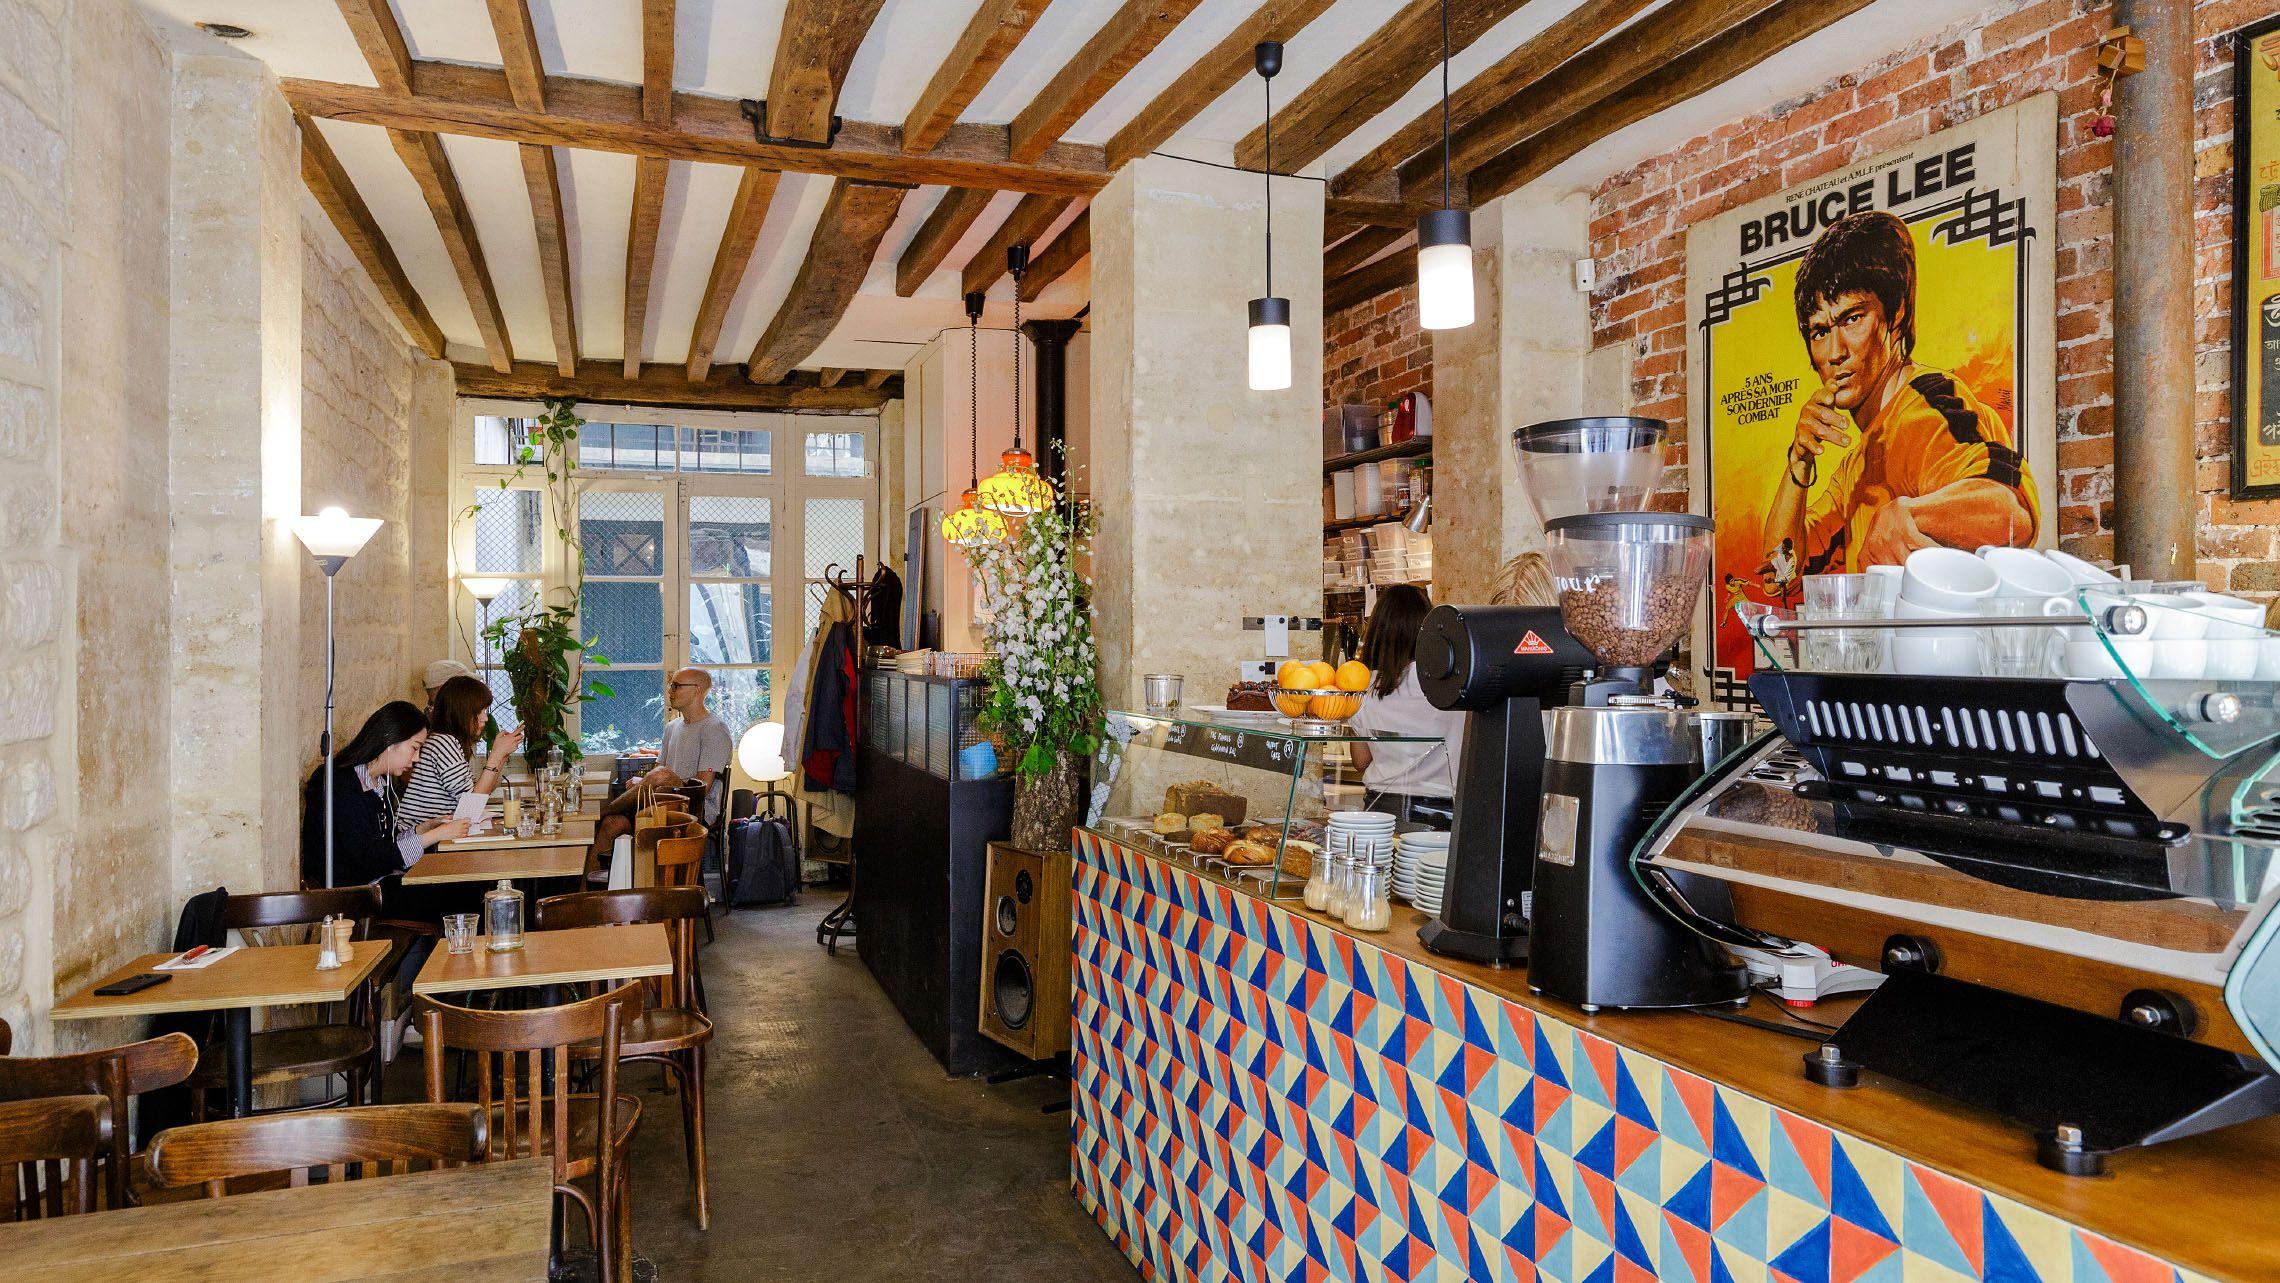 Restaurant Bruce Lee: description, interior, menu and reviews of visitors 33